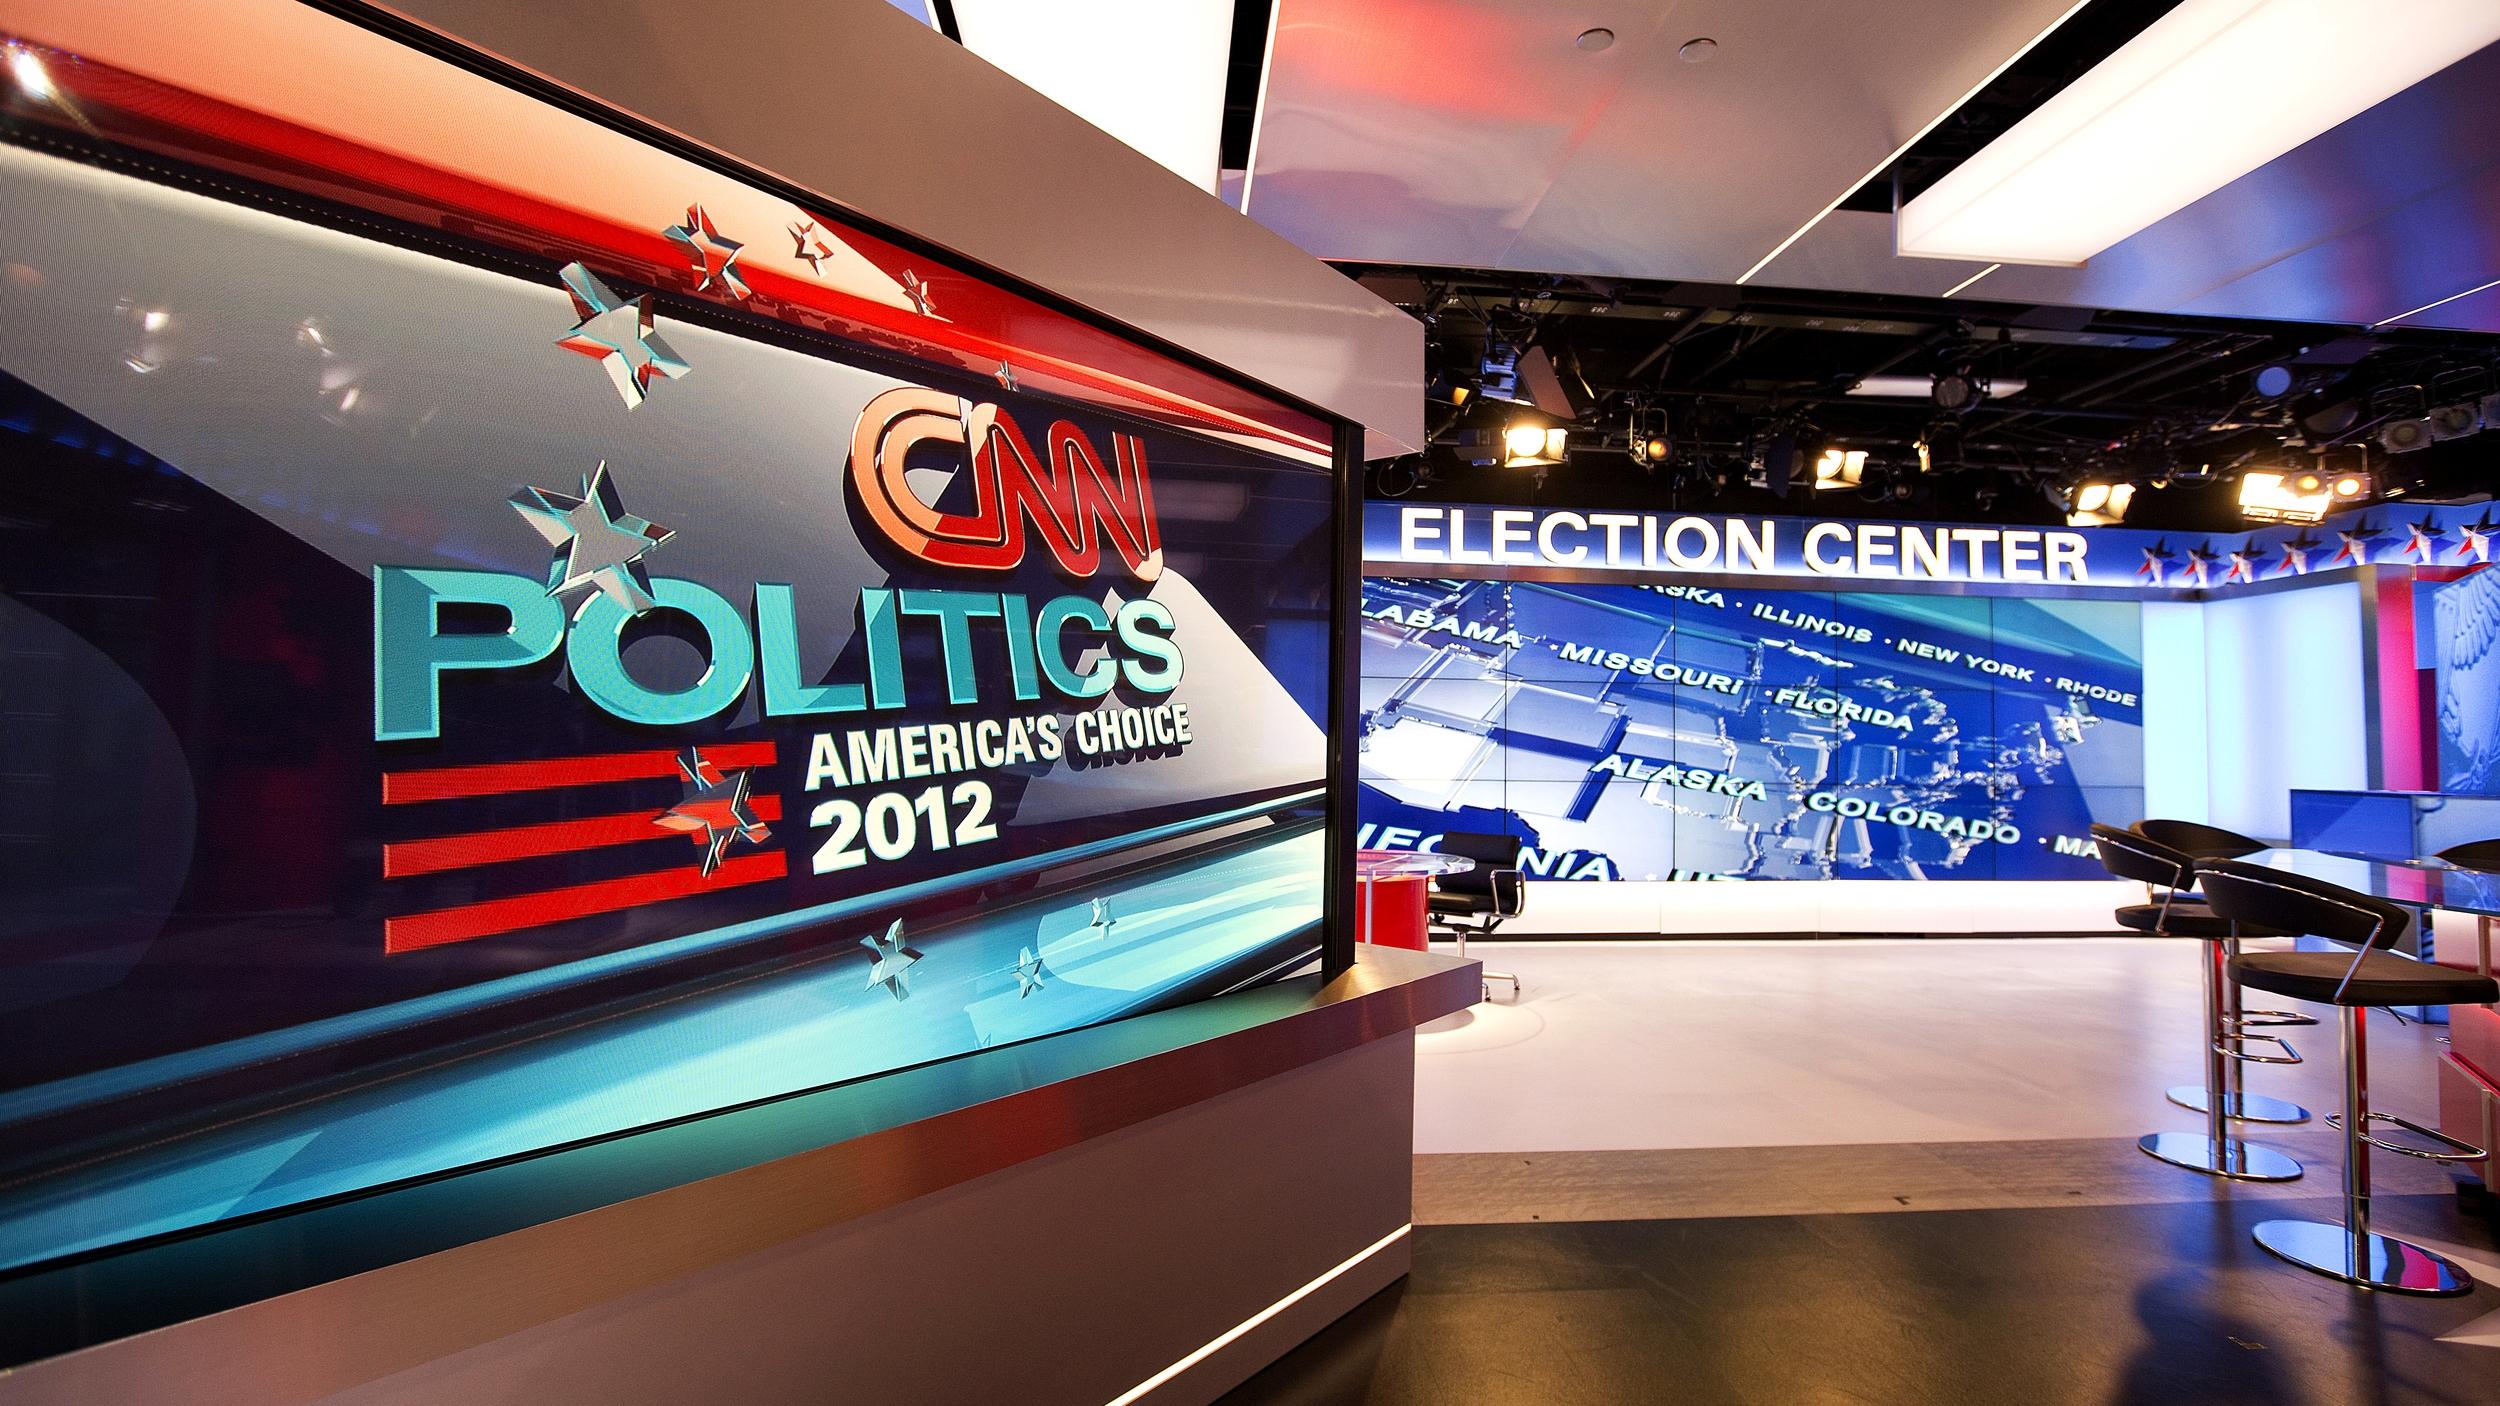 cnn_wdc_election_center15.JPG